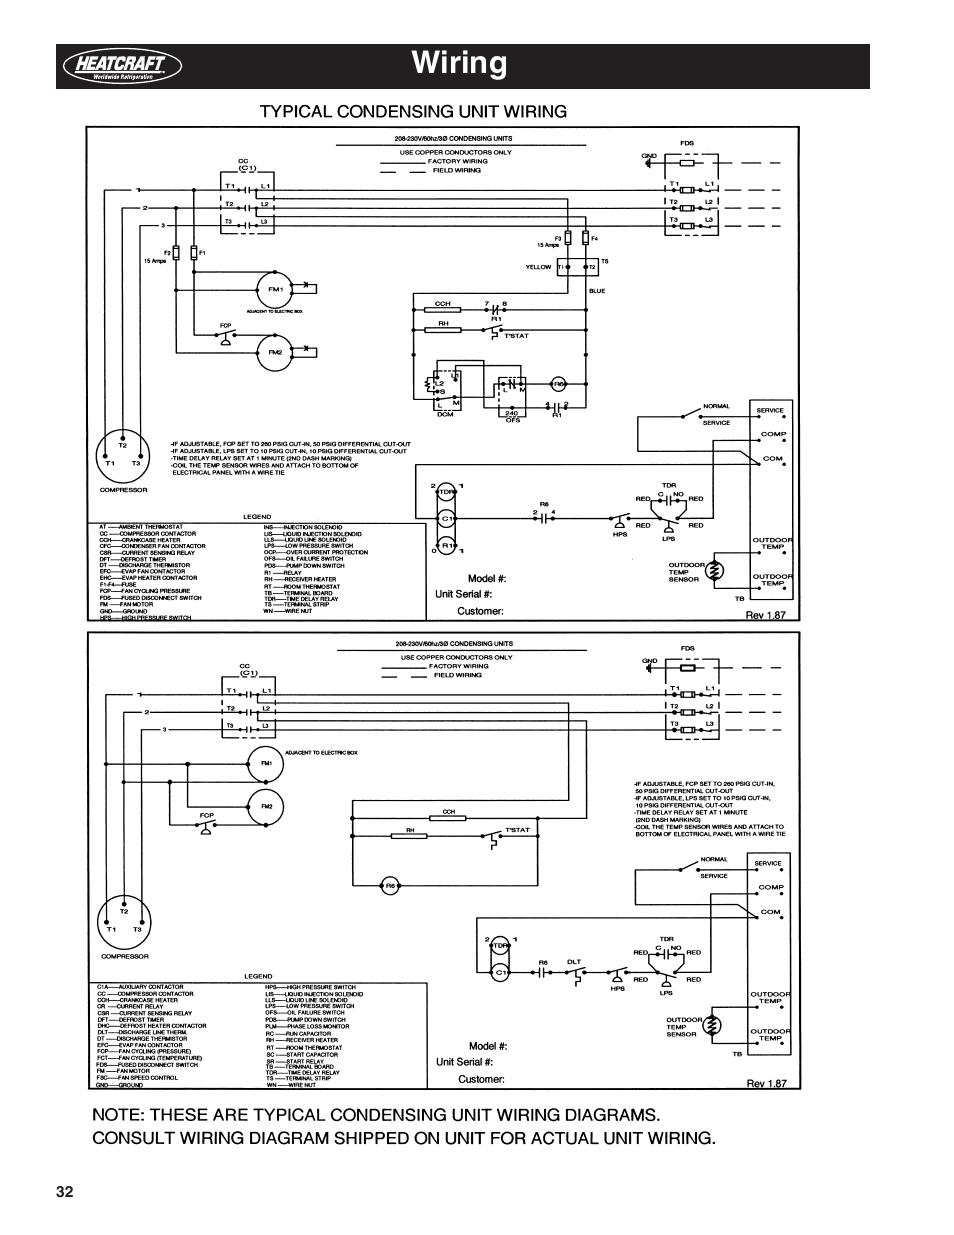 Heatcraft Condensing Unit Wiring Diagram